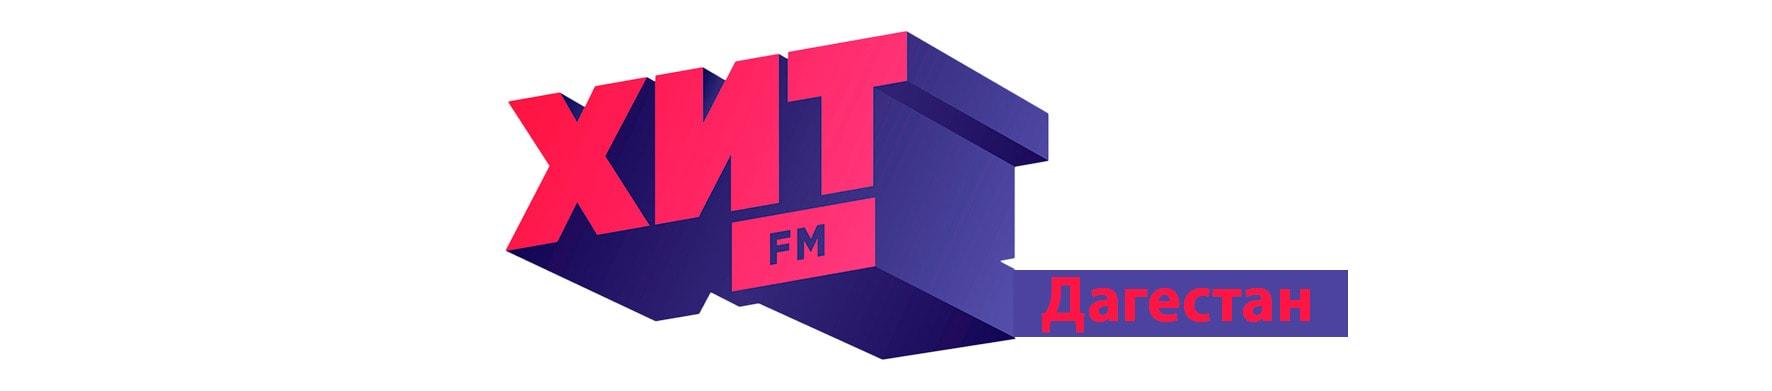 Реклама на радио в Дагестане Хит FM